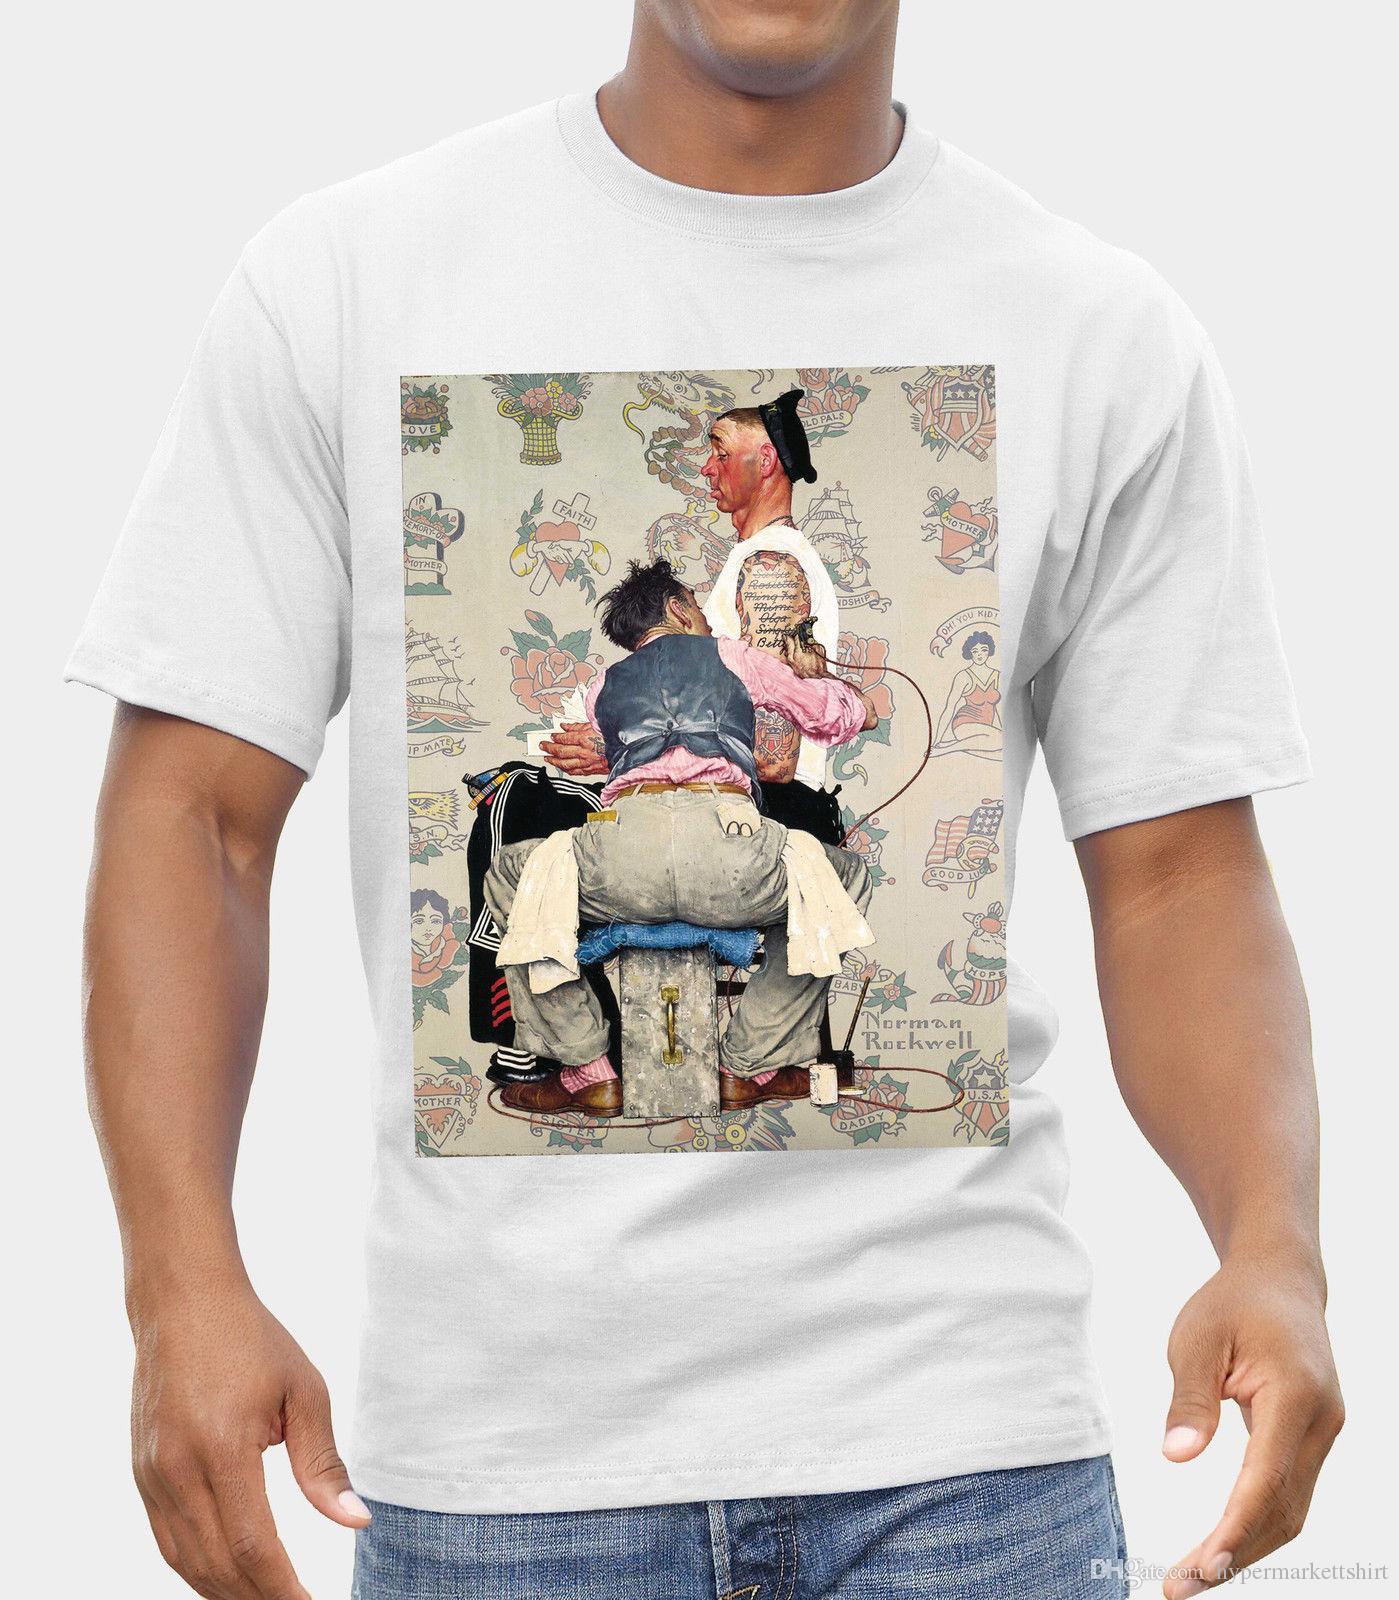 Norman Rockwell Shirt Loom T Of Logo Artist Tattoo New The Fruit qzSUMVpG